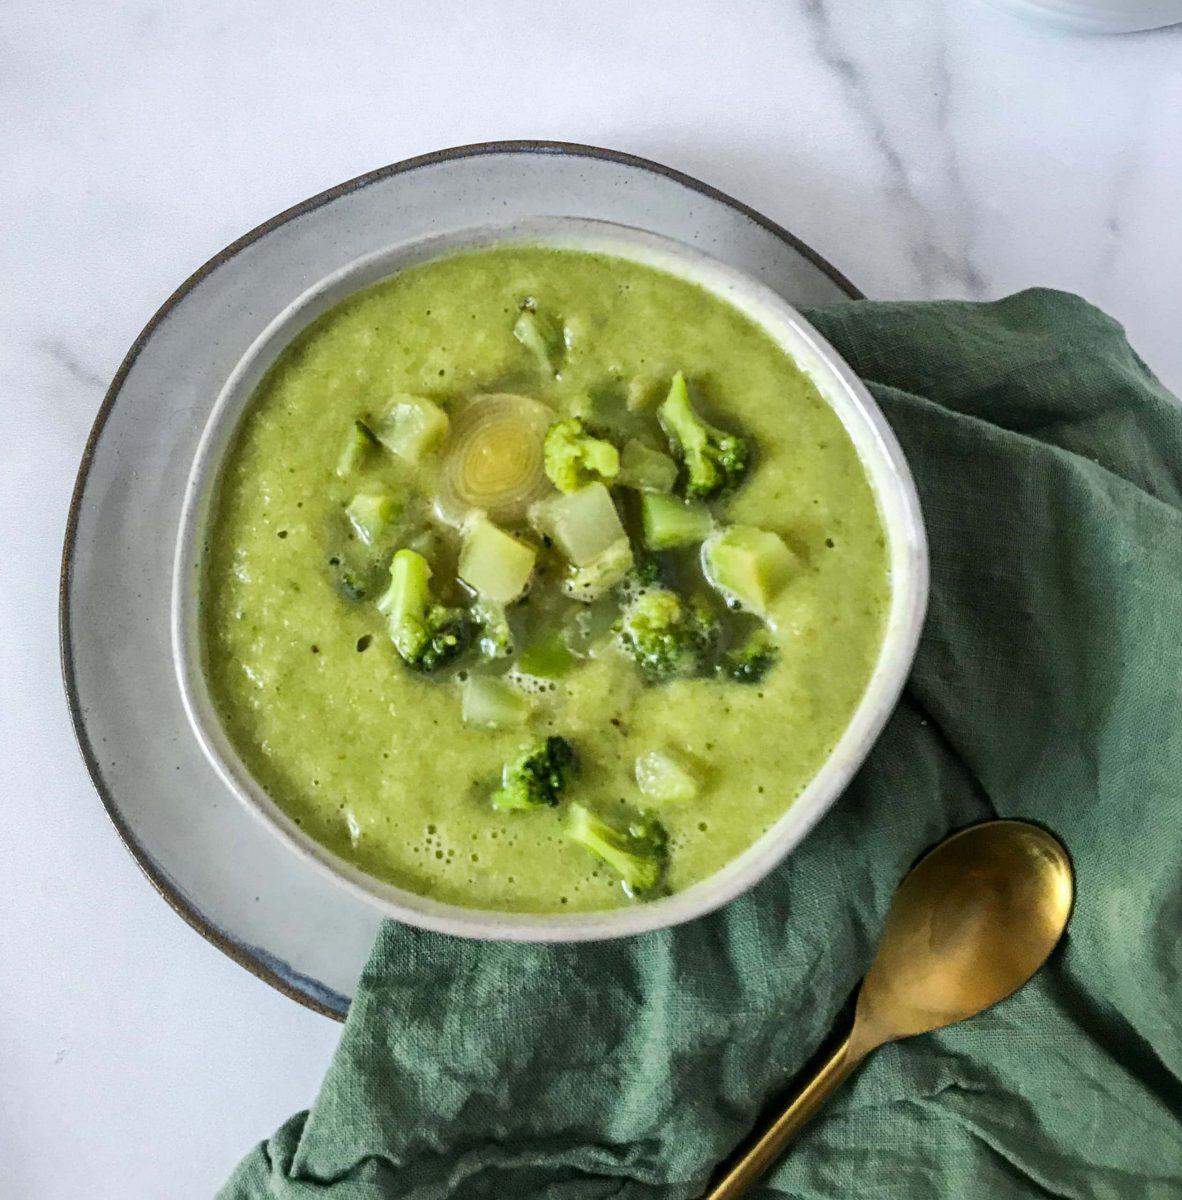 A bowl of creamy zucchini soup